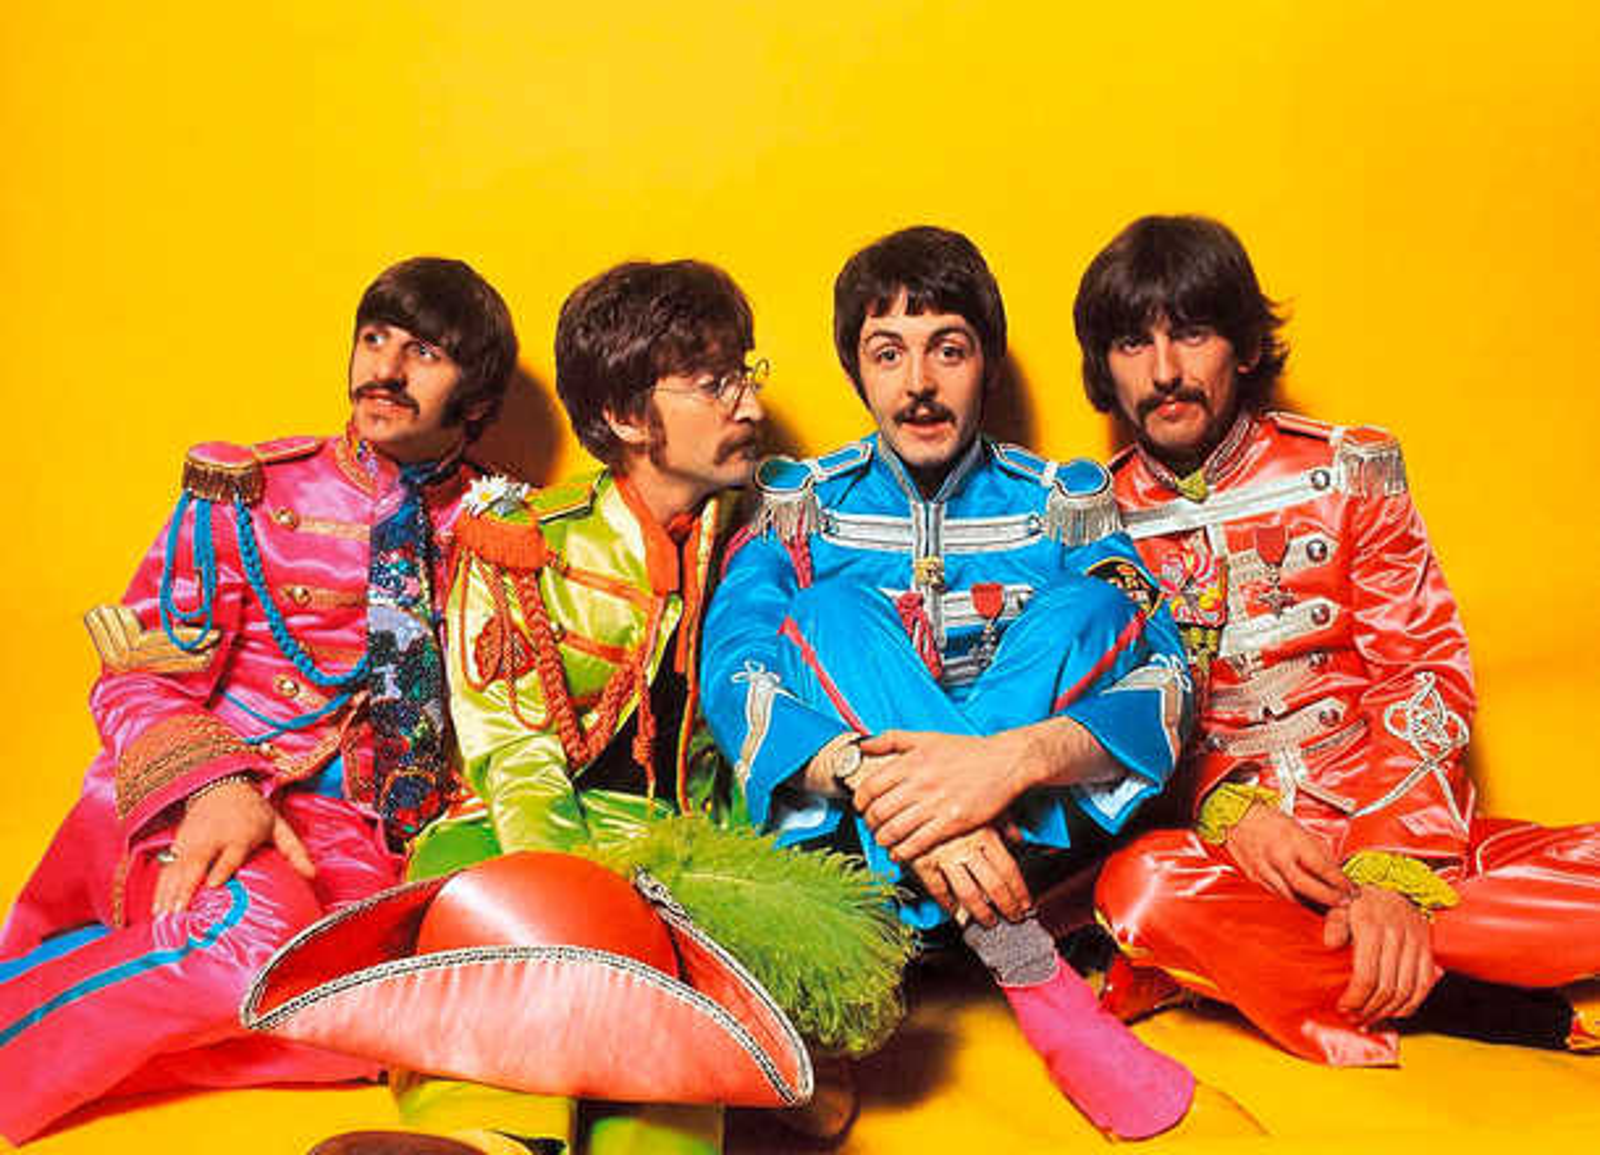 The Beatles - Music Legends